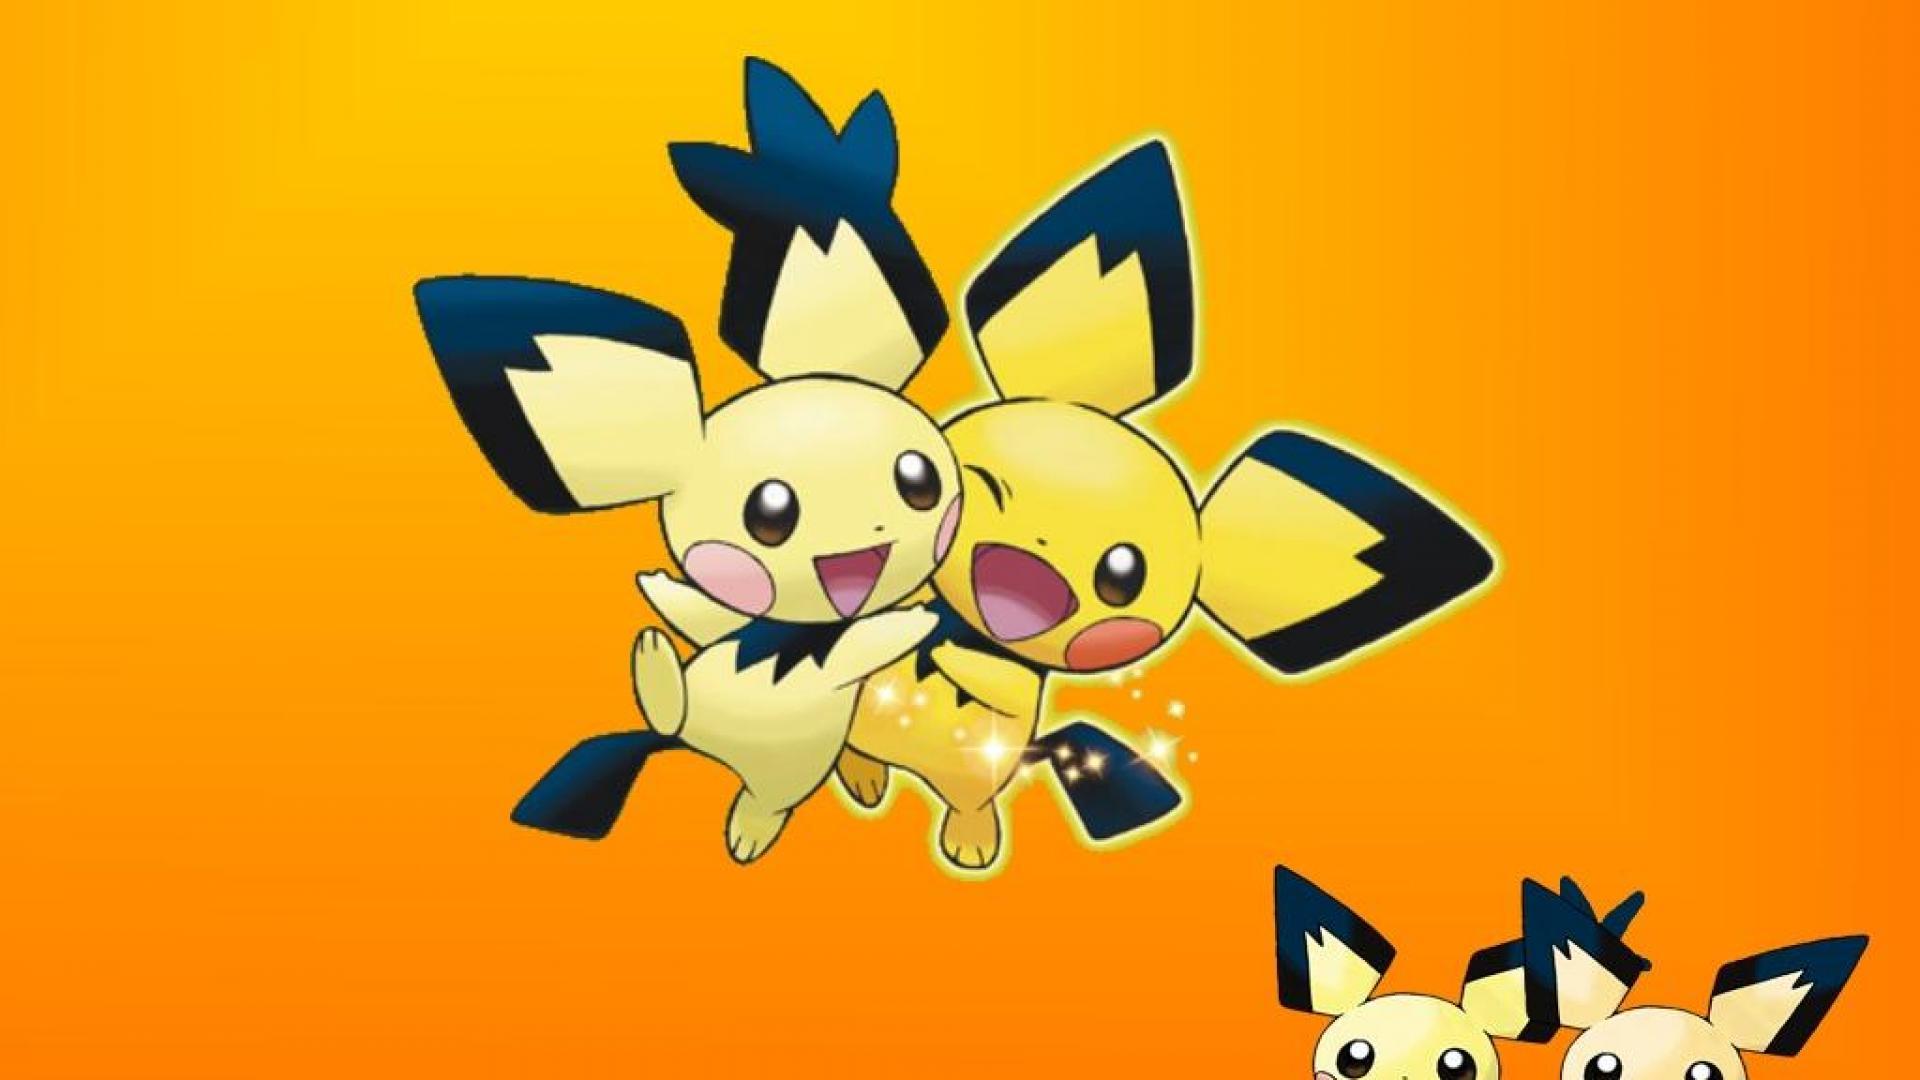 Duo Pichu Pokemon Go New Wallpaper 3038 Wallpaper Themes 1920x1080